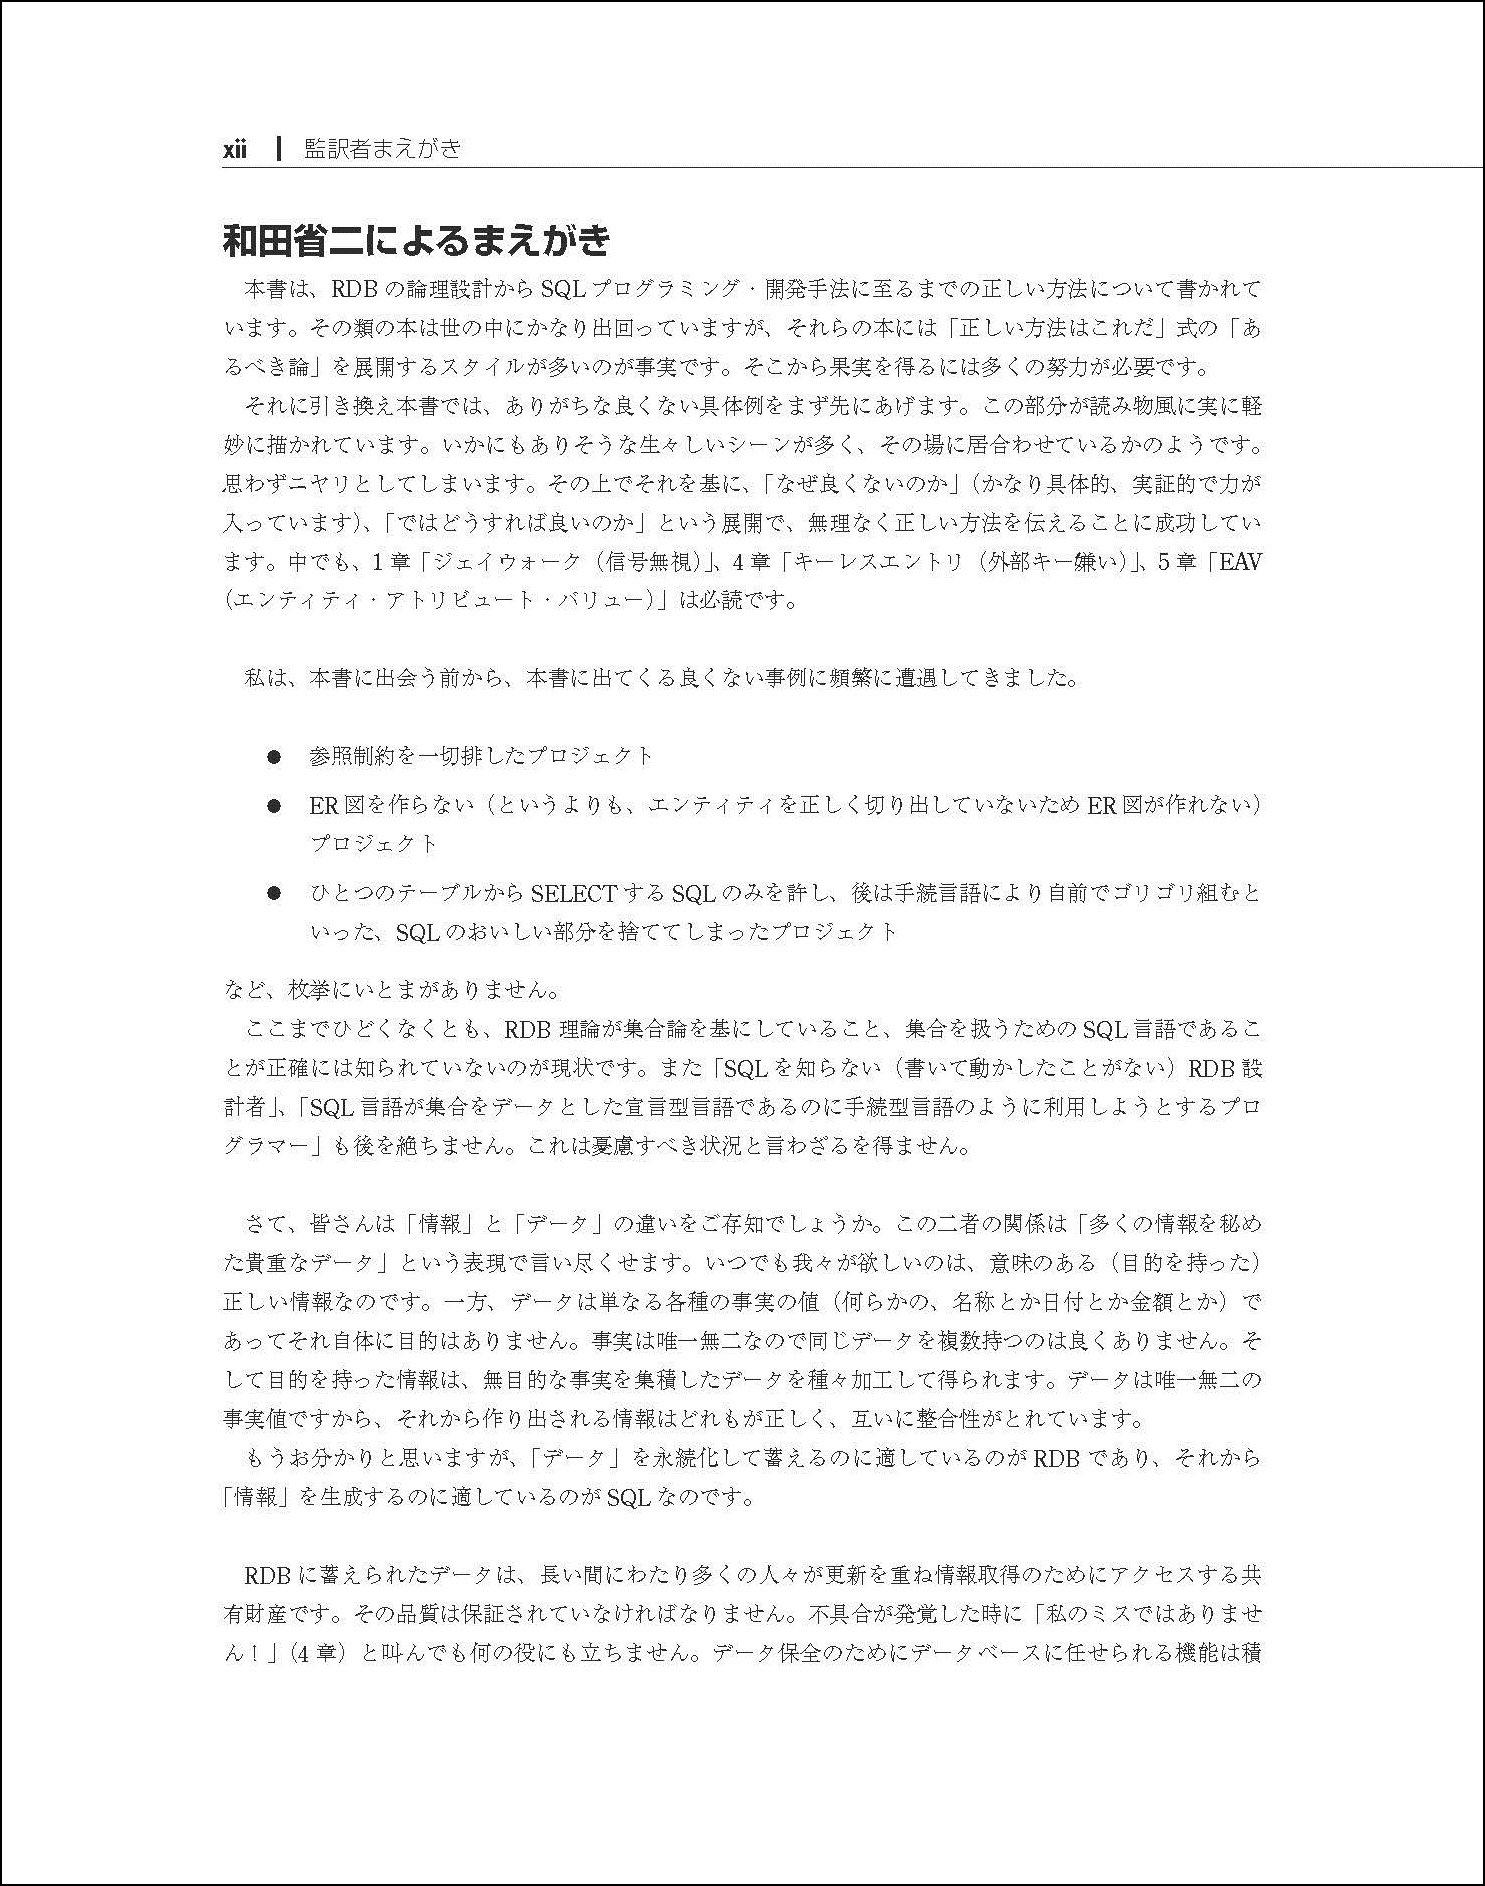 Worksheets Great Depression Worksheets esukyueru anchipatan amazon co uk bill karwin takuto wada shoji osamu kojima 9784873115894 books